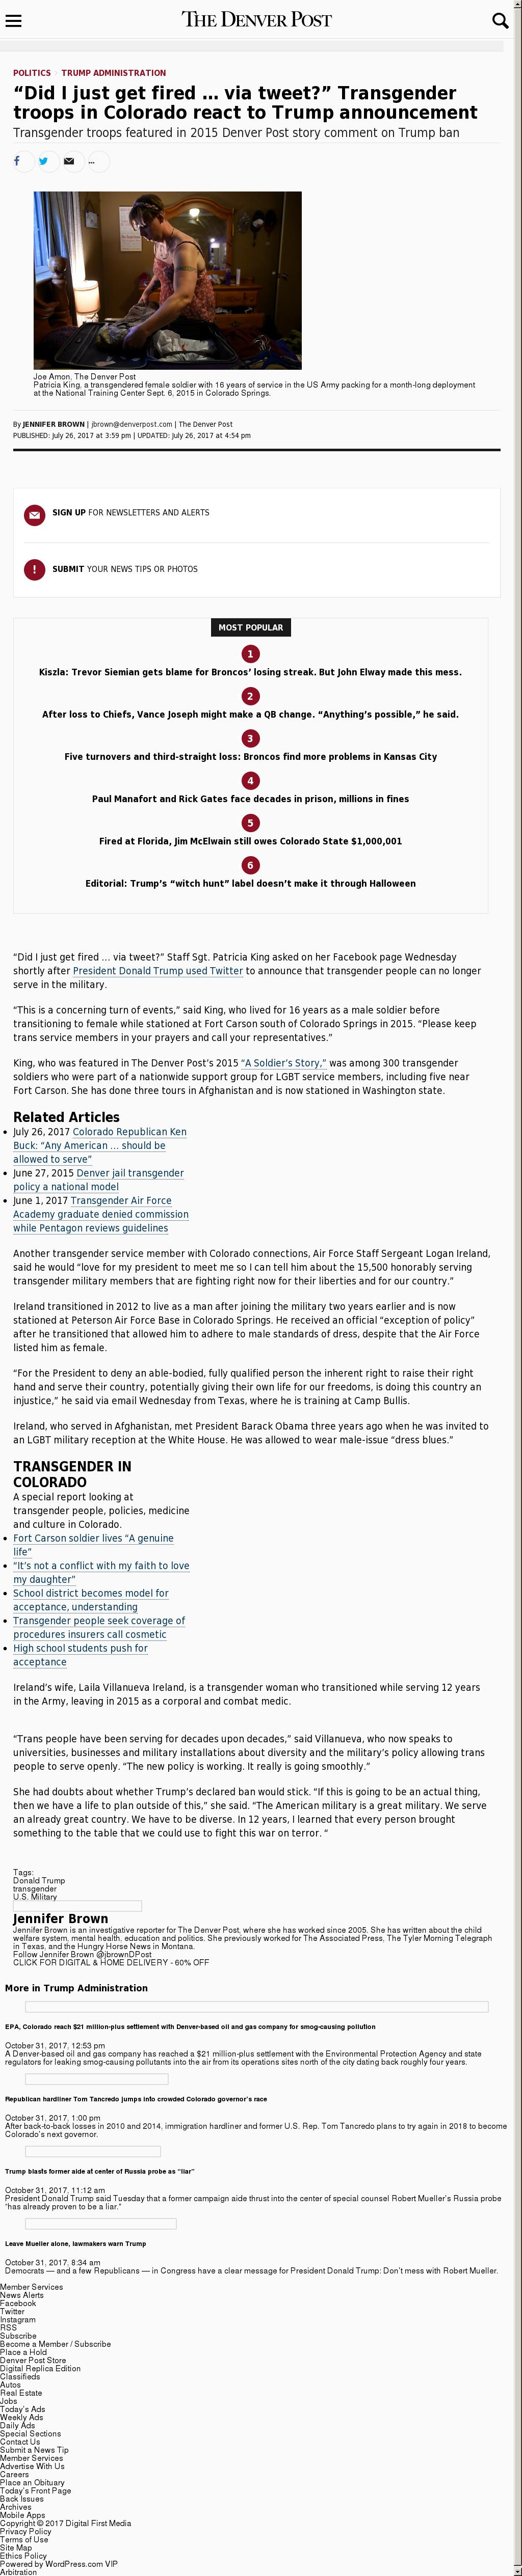 Denver Post at Tuesday Oct. 31, 2017, 7:04 p.m. UTC